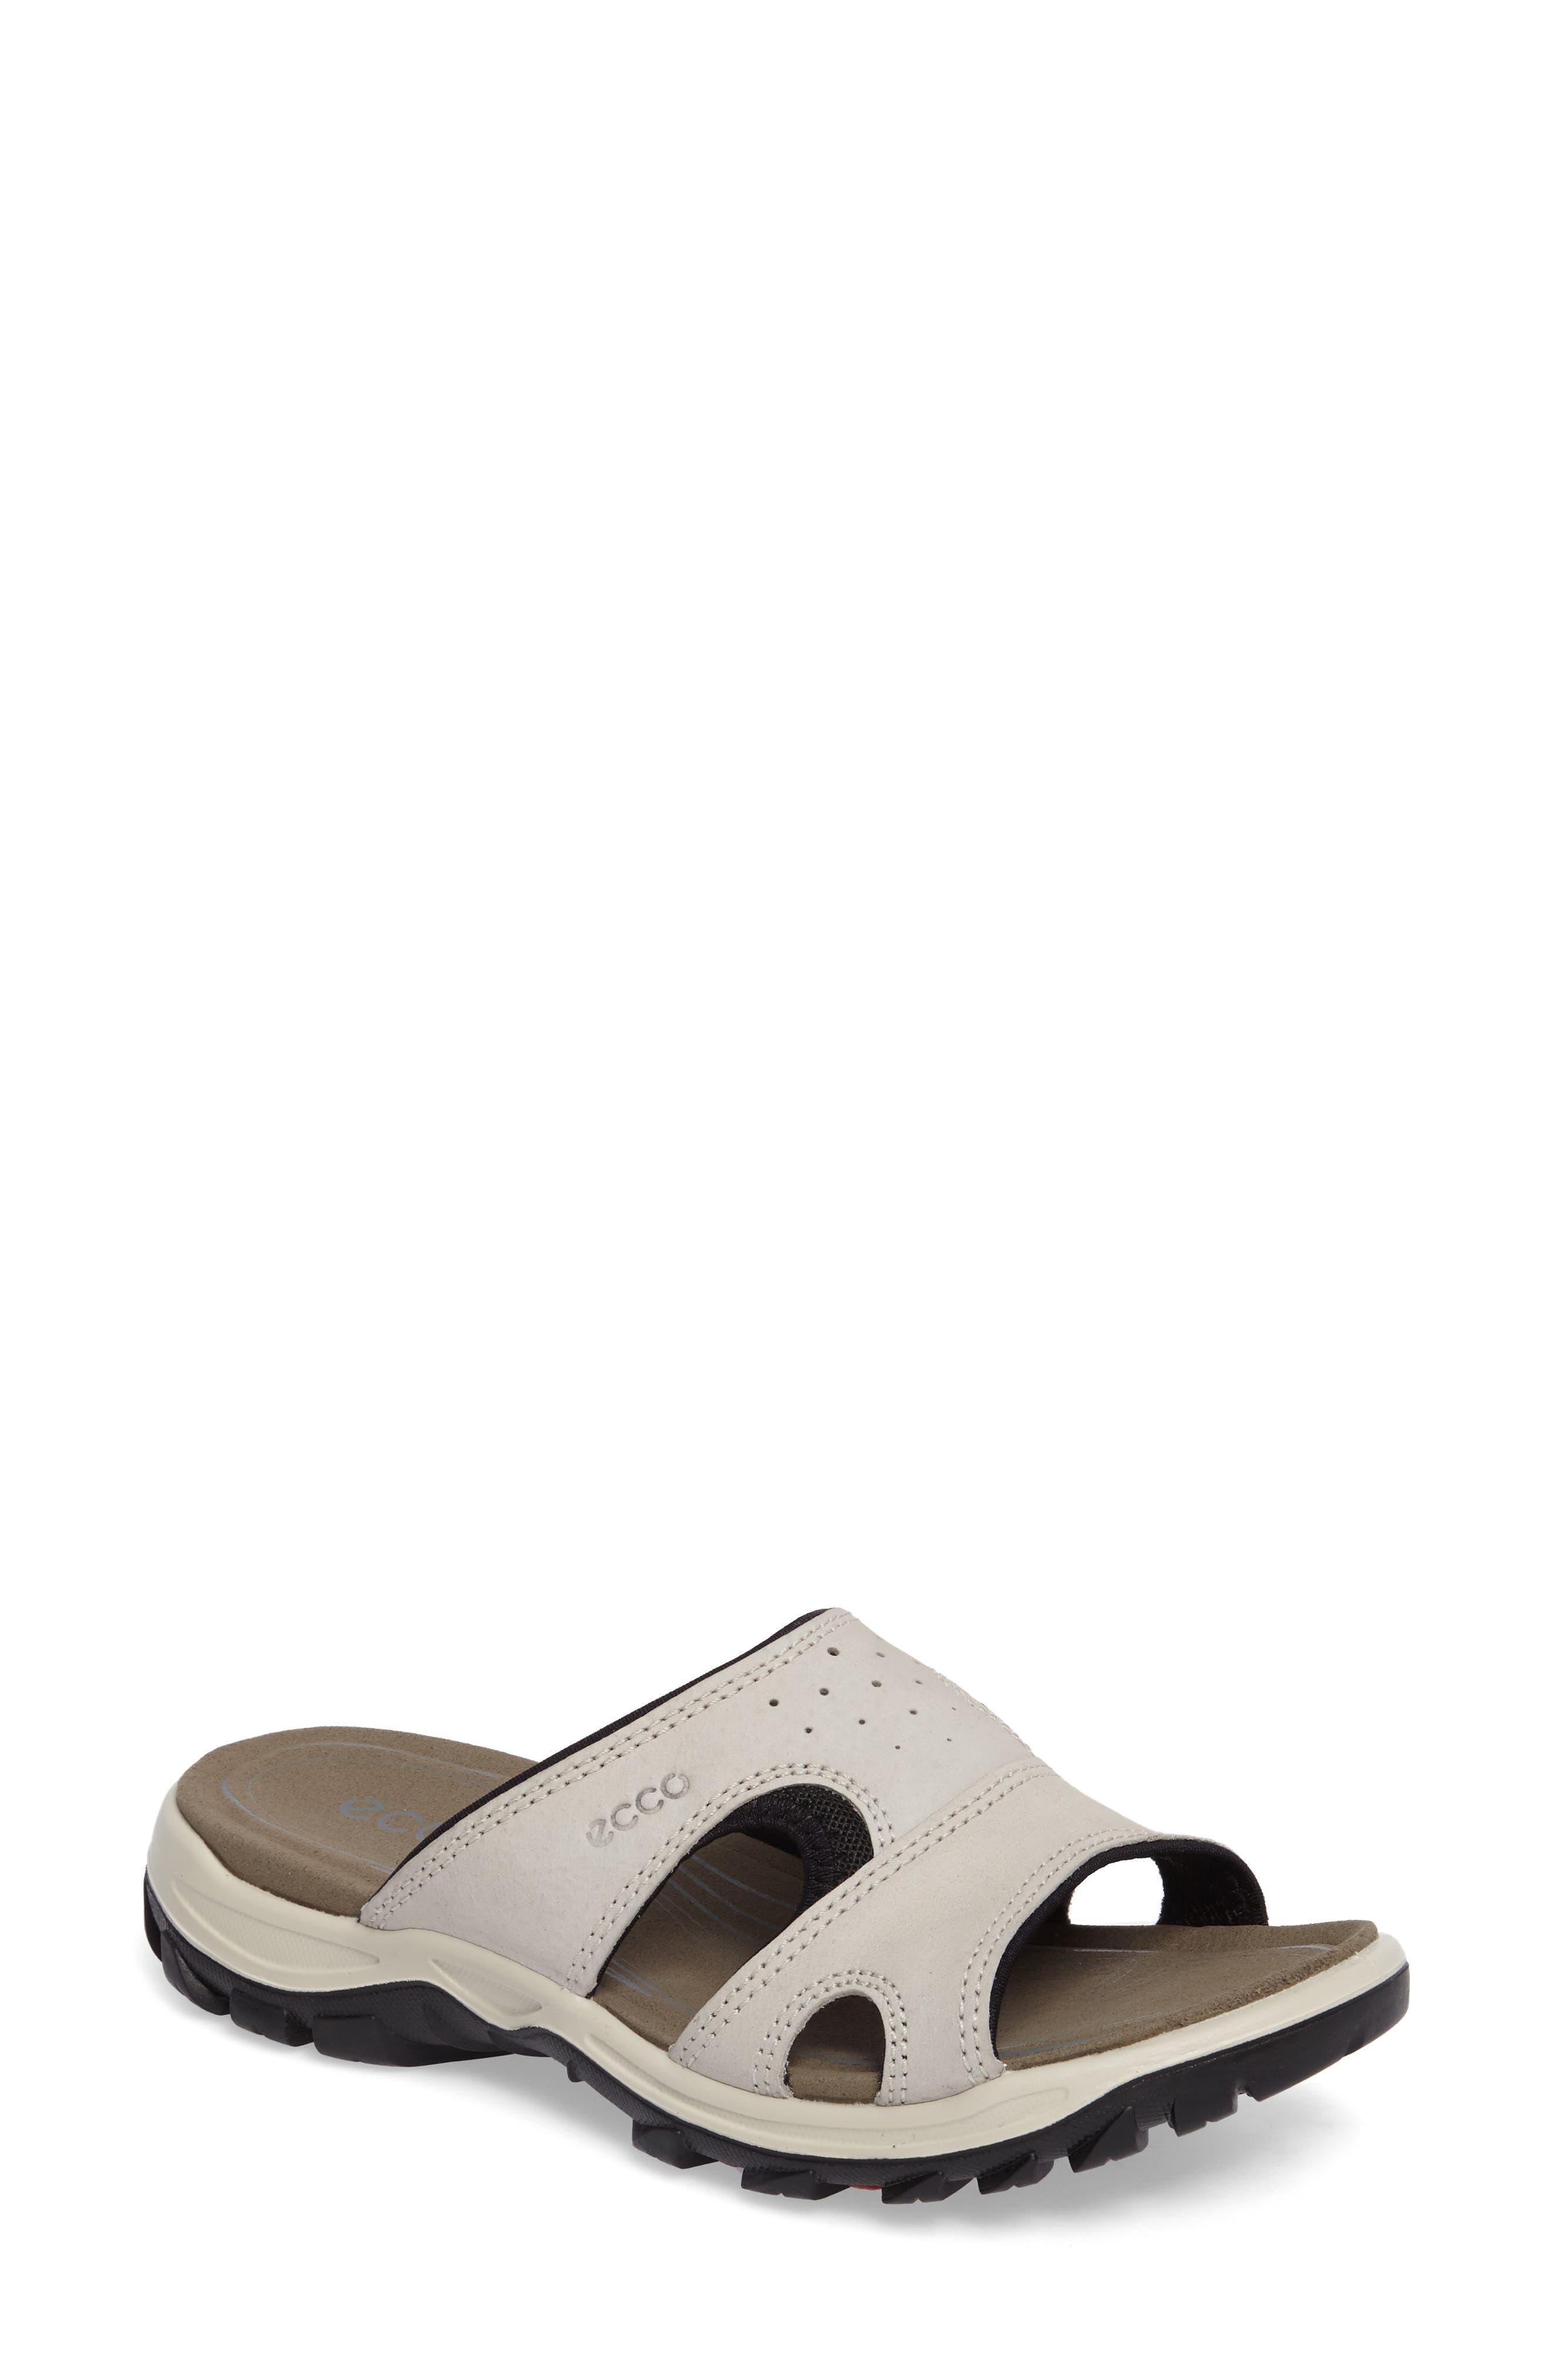 Ecco Offroad Lite Slide Sandal, Grey